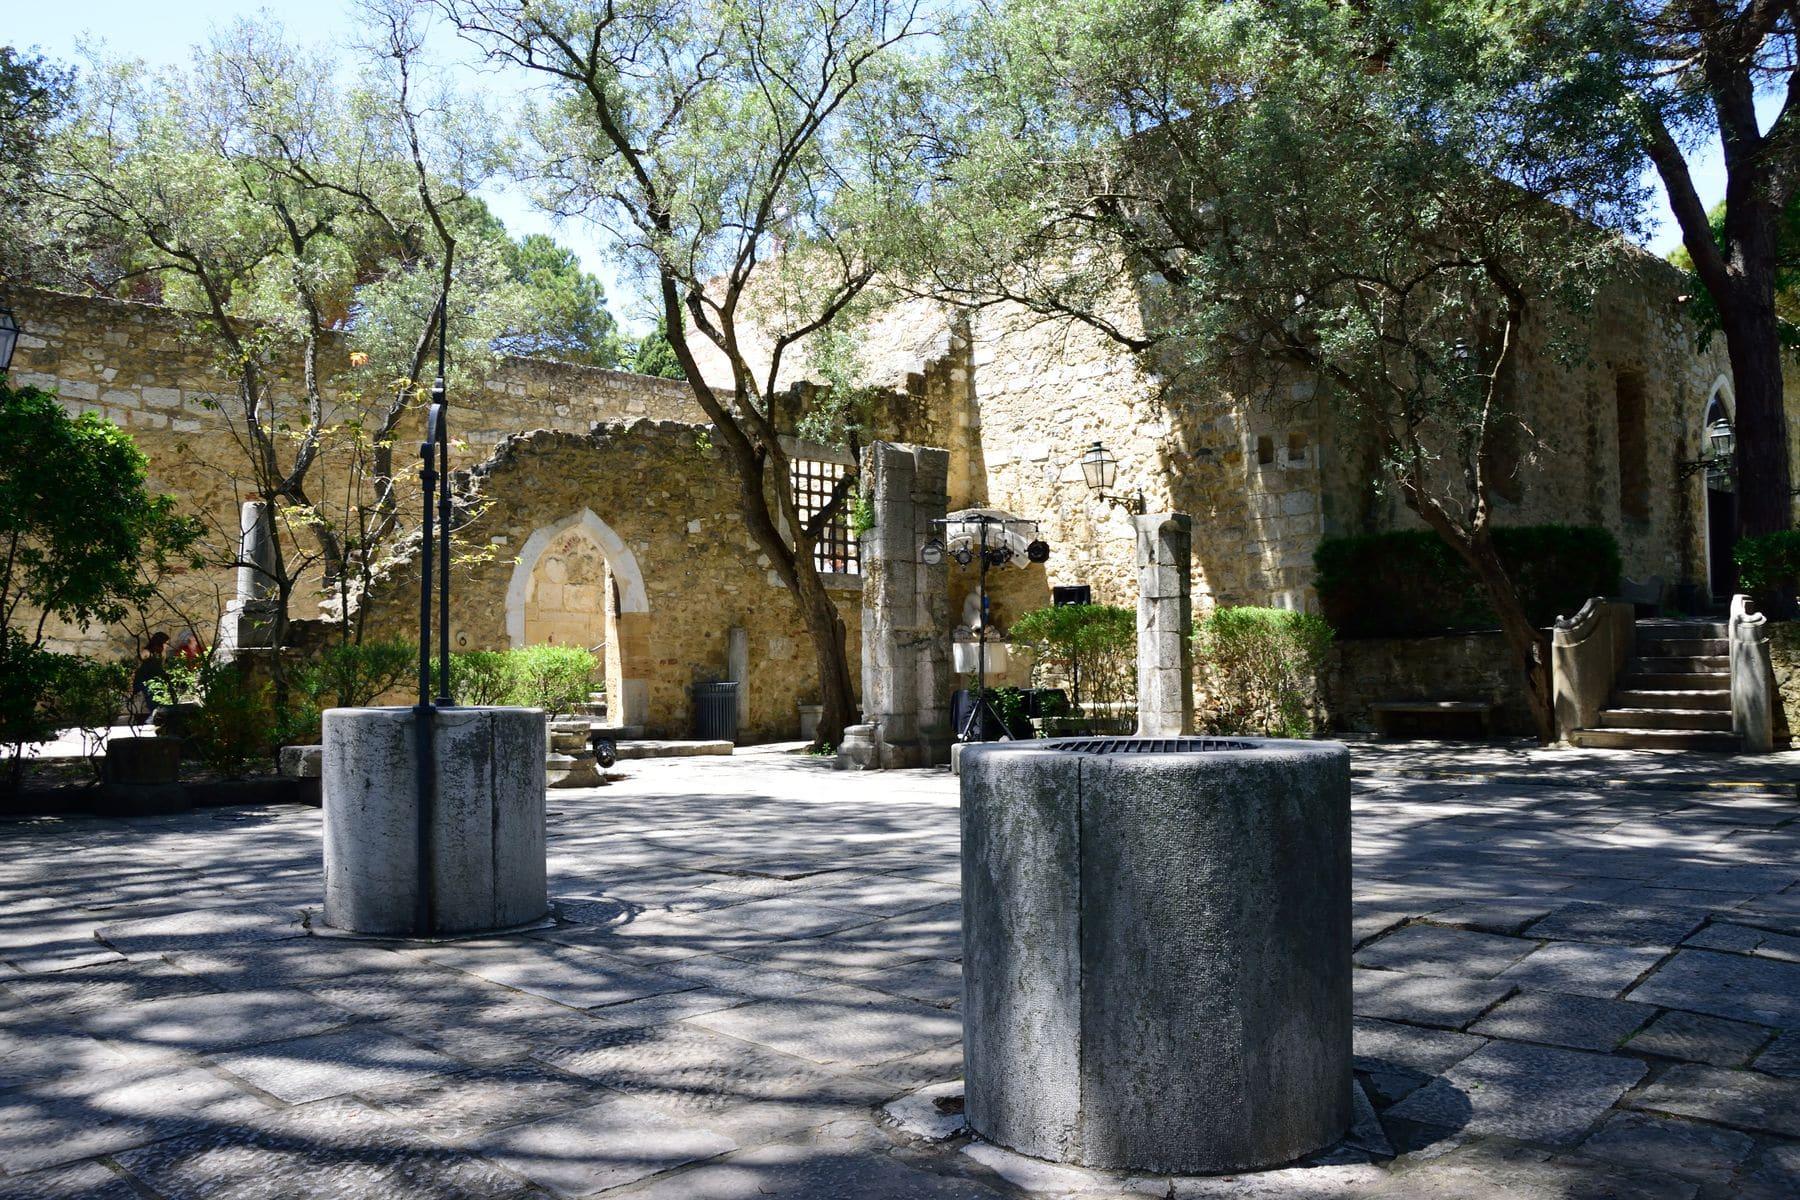 Giardino Romantico al Castello di São Jorge